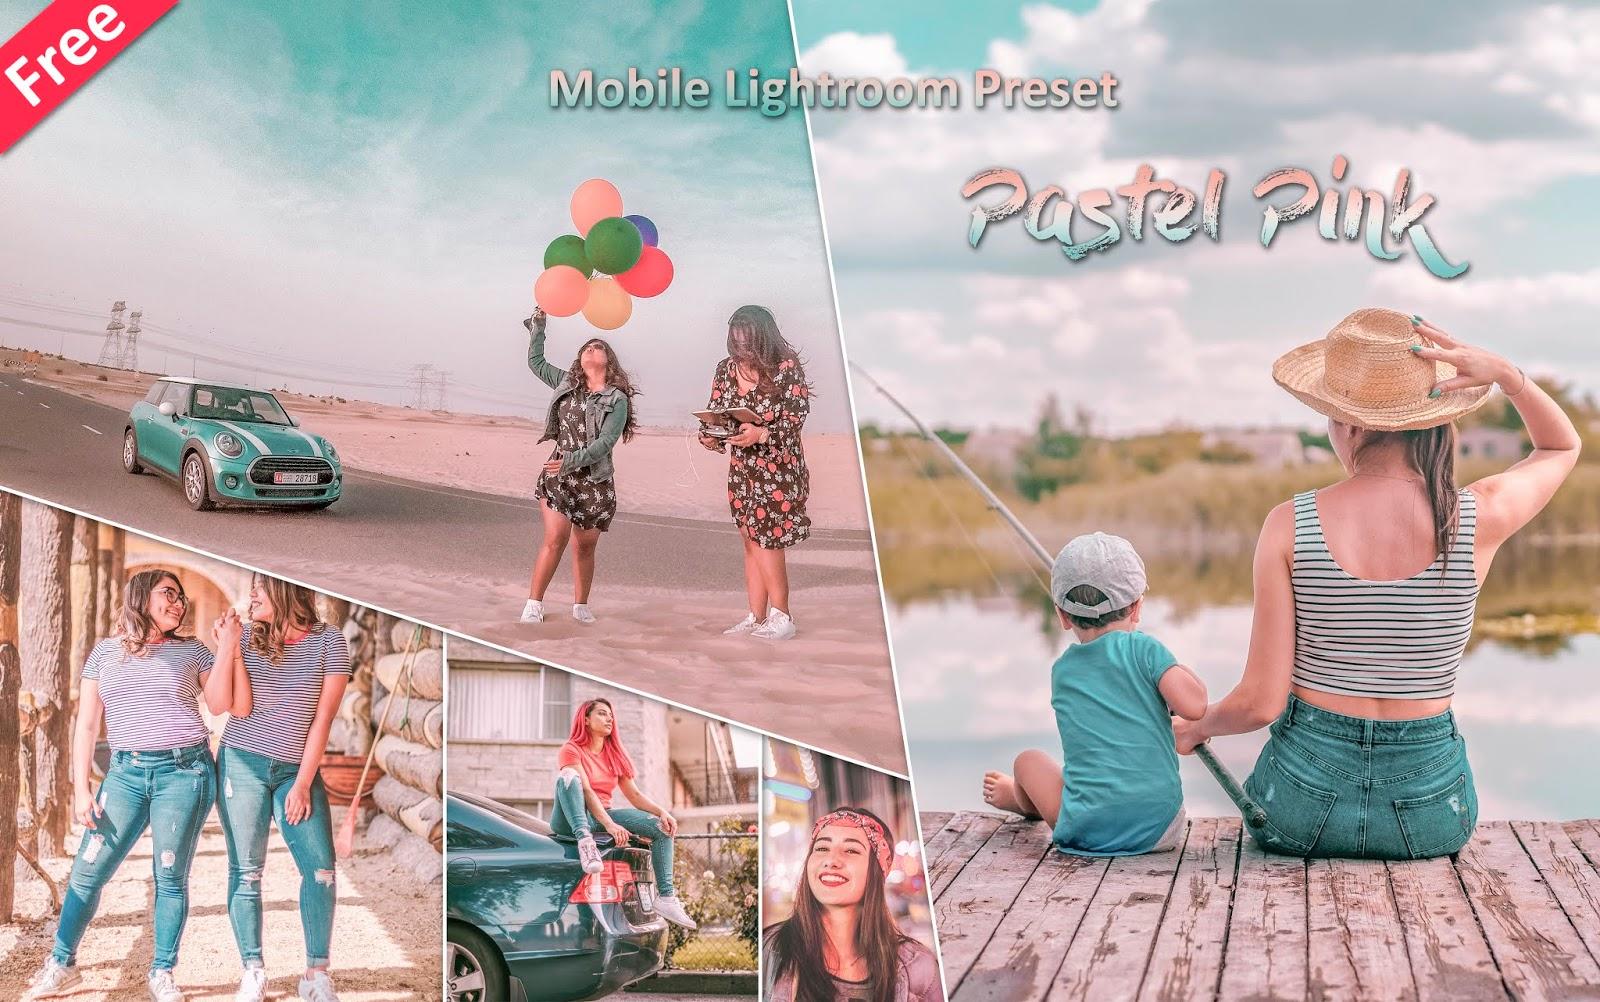 Download Pink Pastel Mobile Lightroom Preset for Free | How to Edit Photos Like Pink Pastel Effect in Mobile Lightroom App